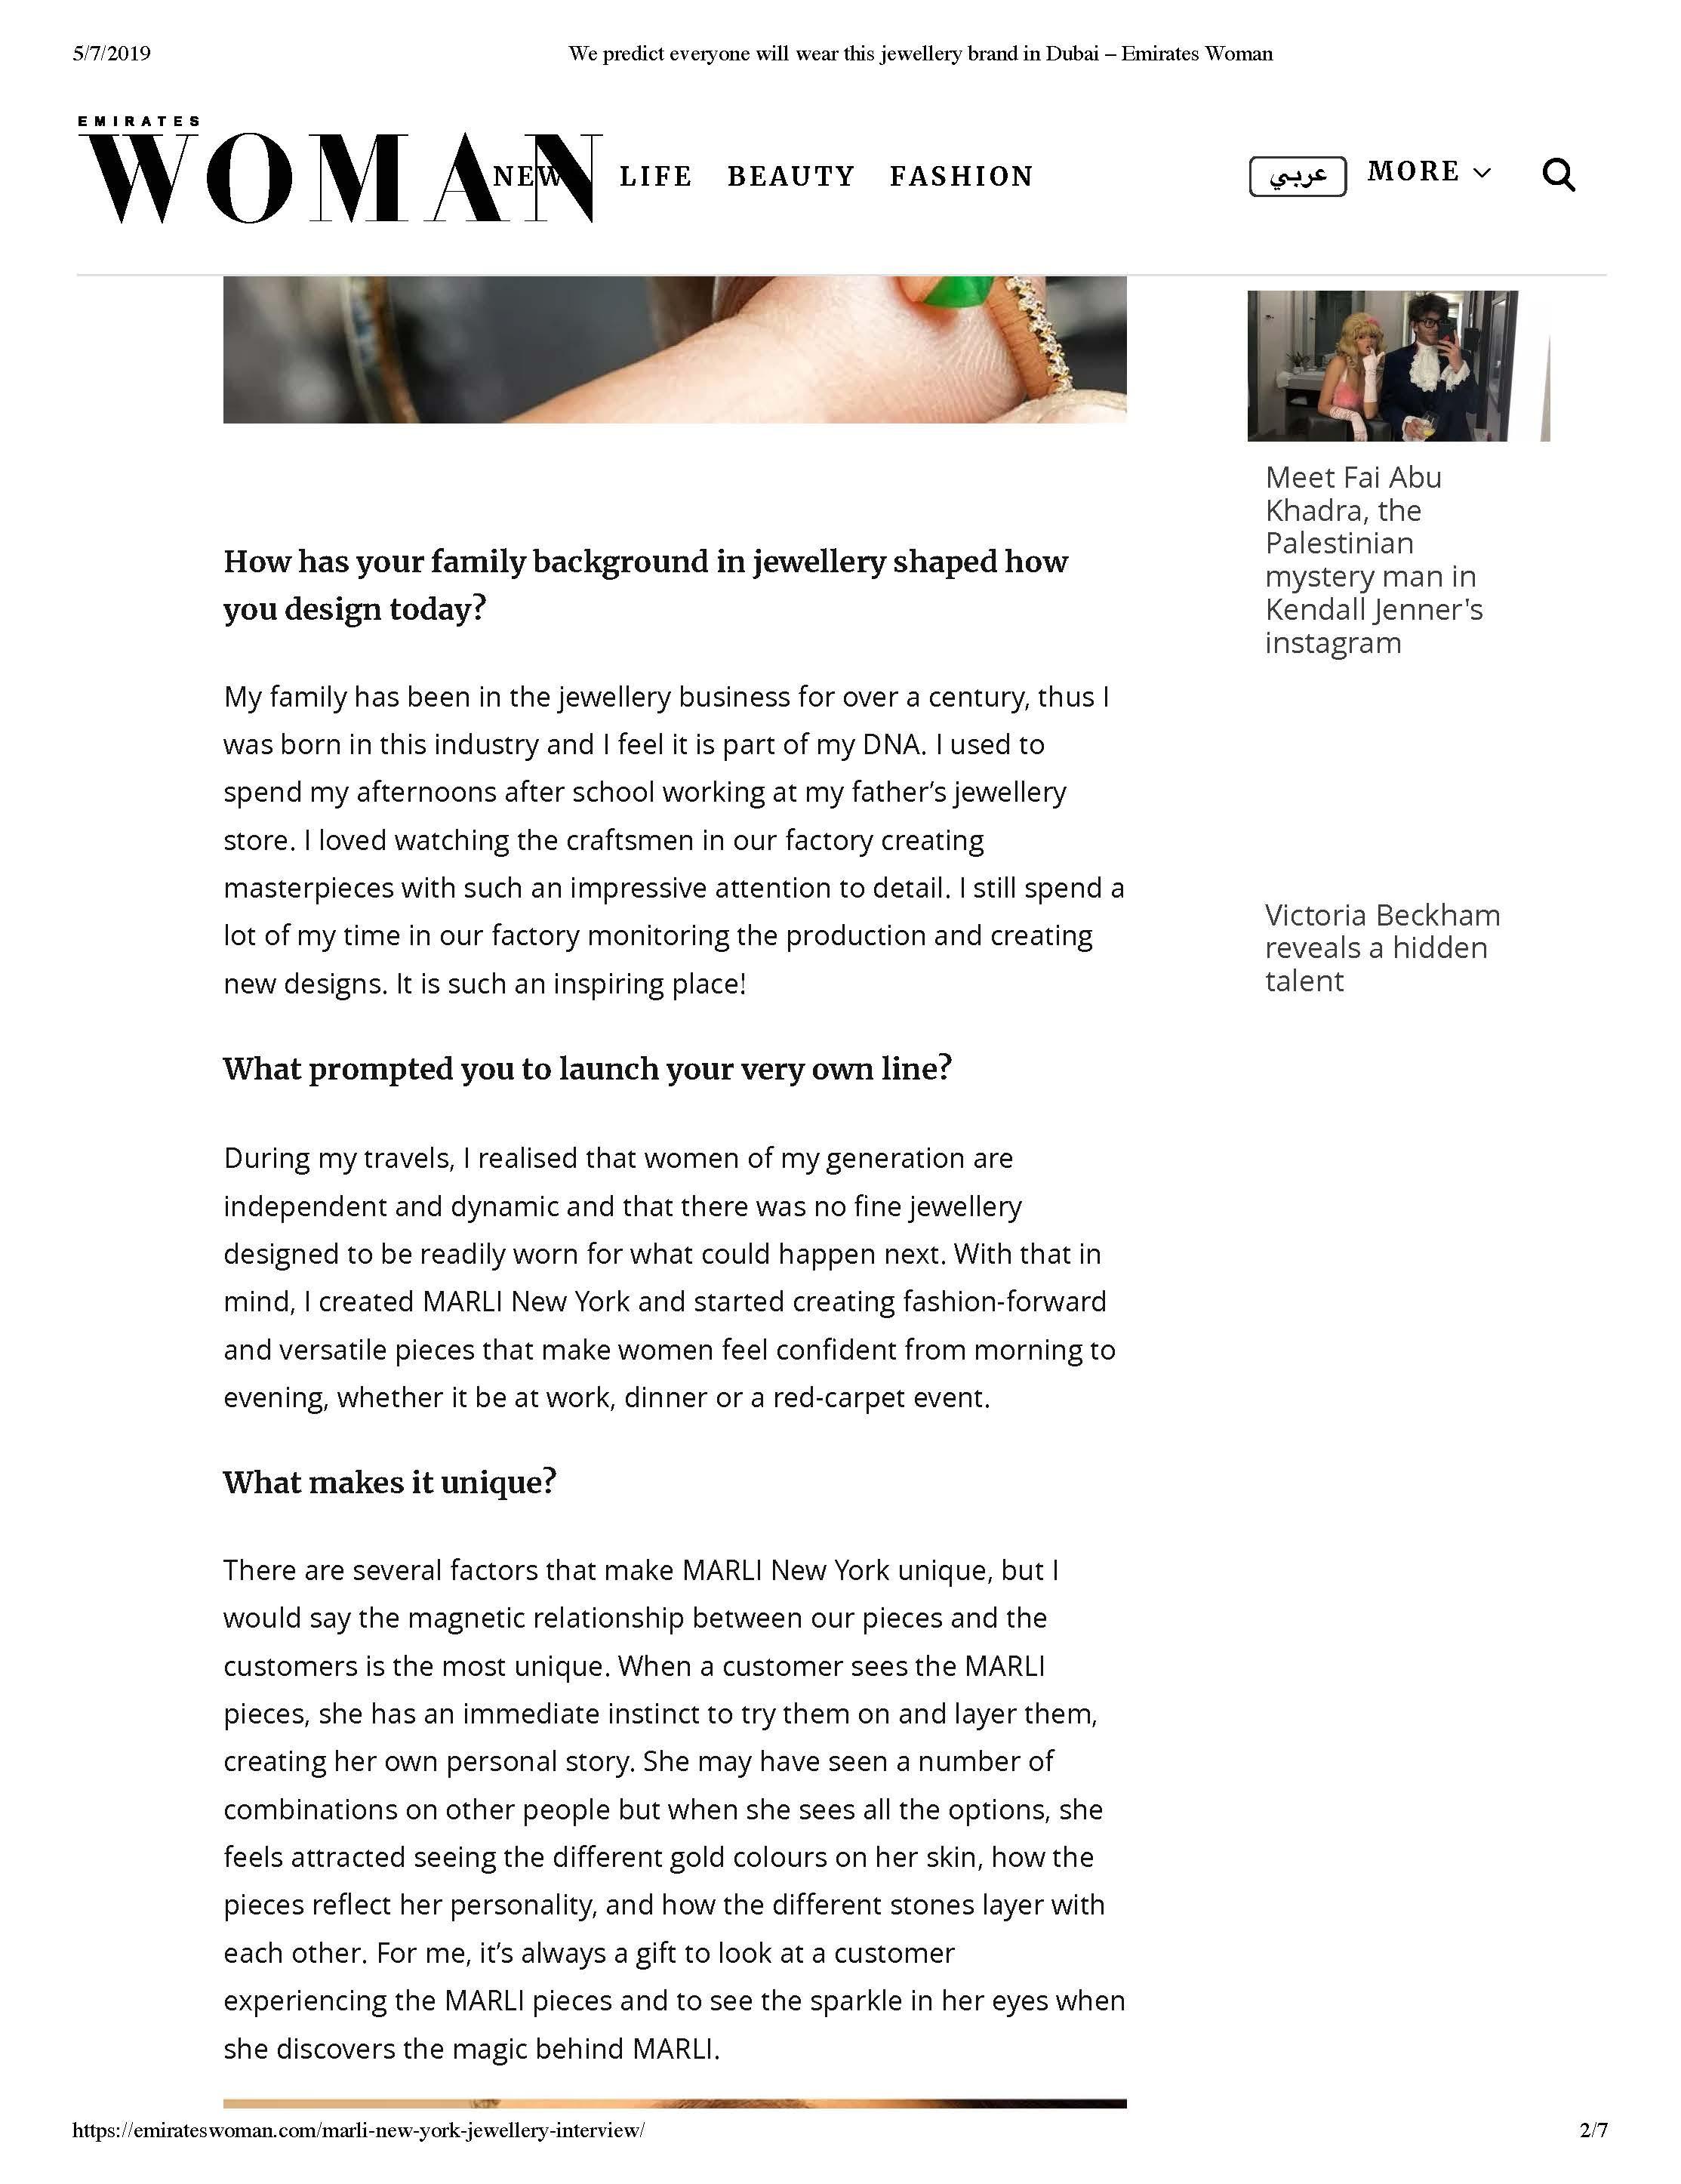 EmiratesWomen - Published Press Release - 5.7.19_Seite_2.jpg